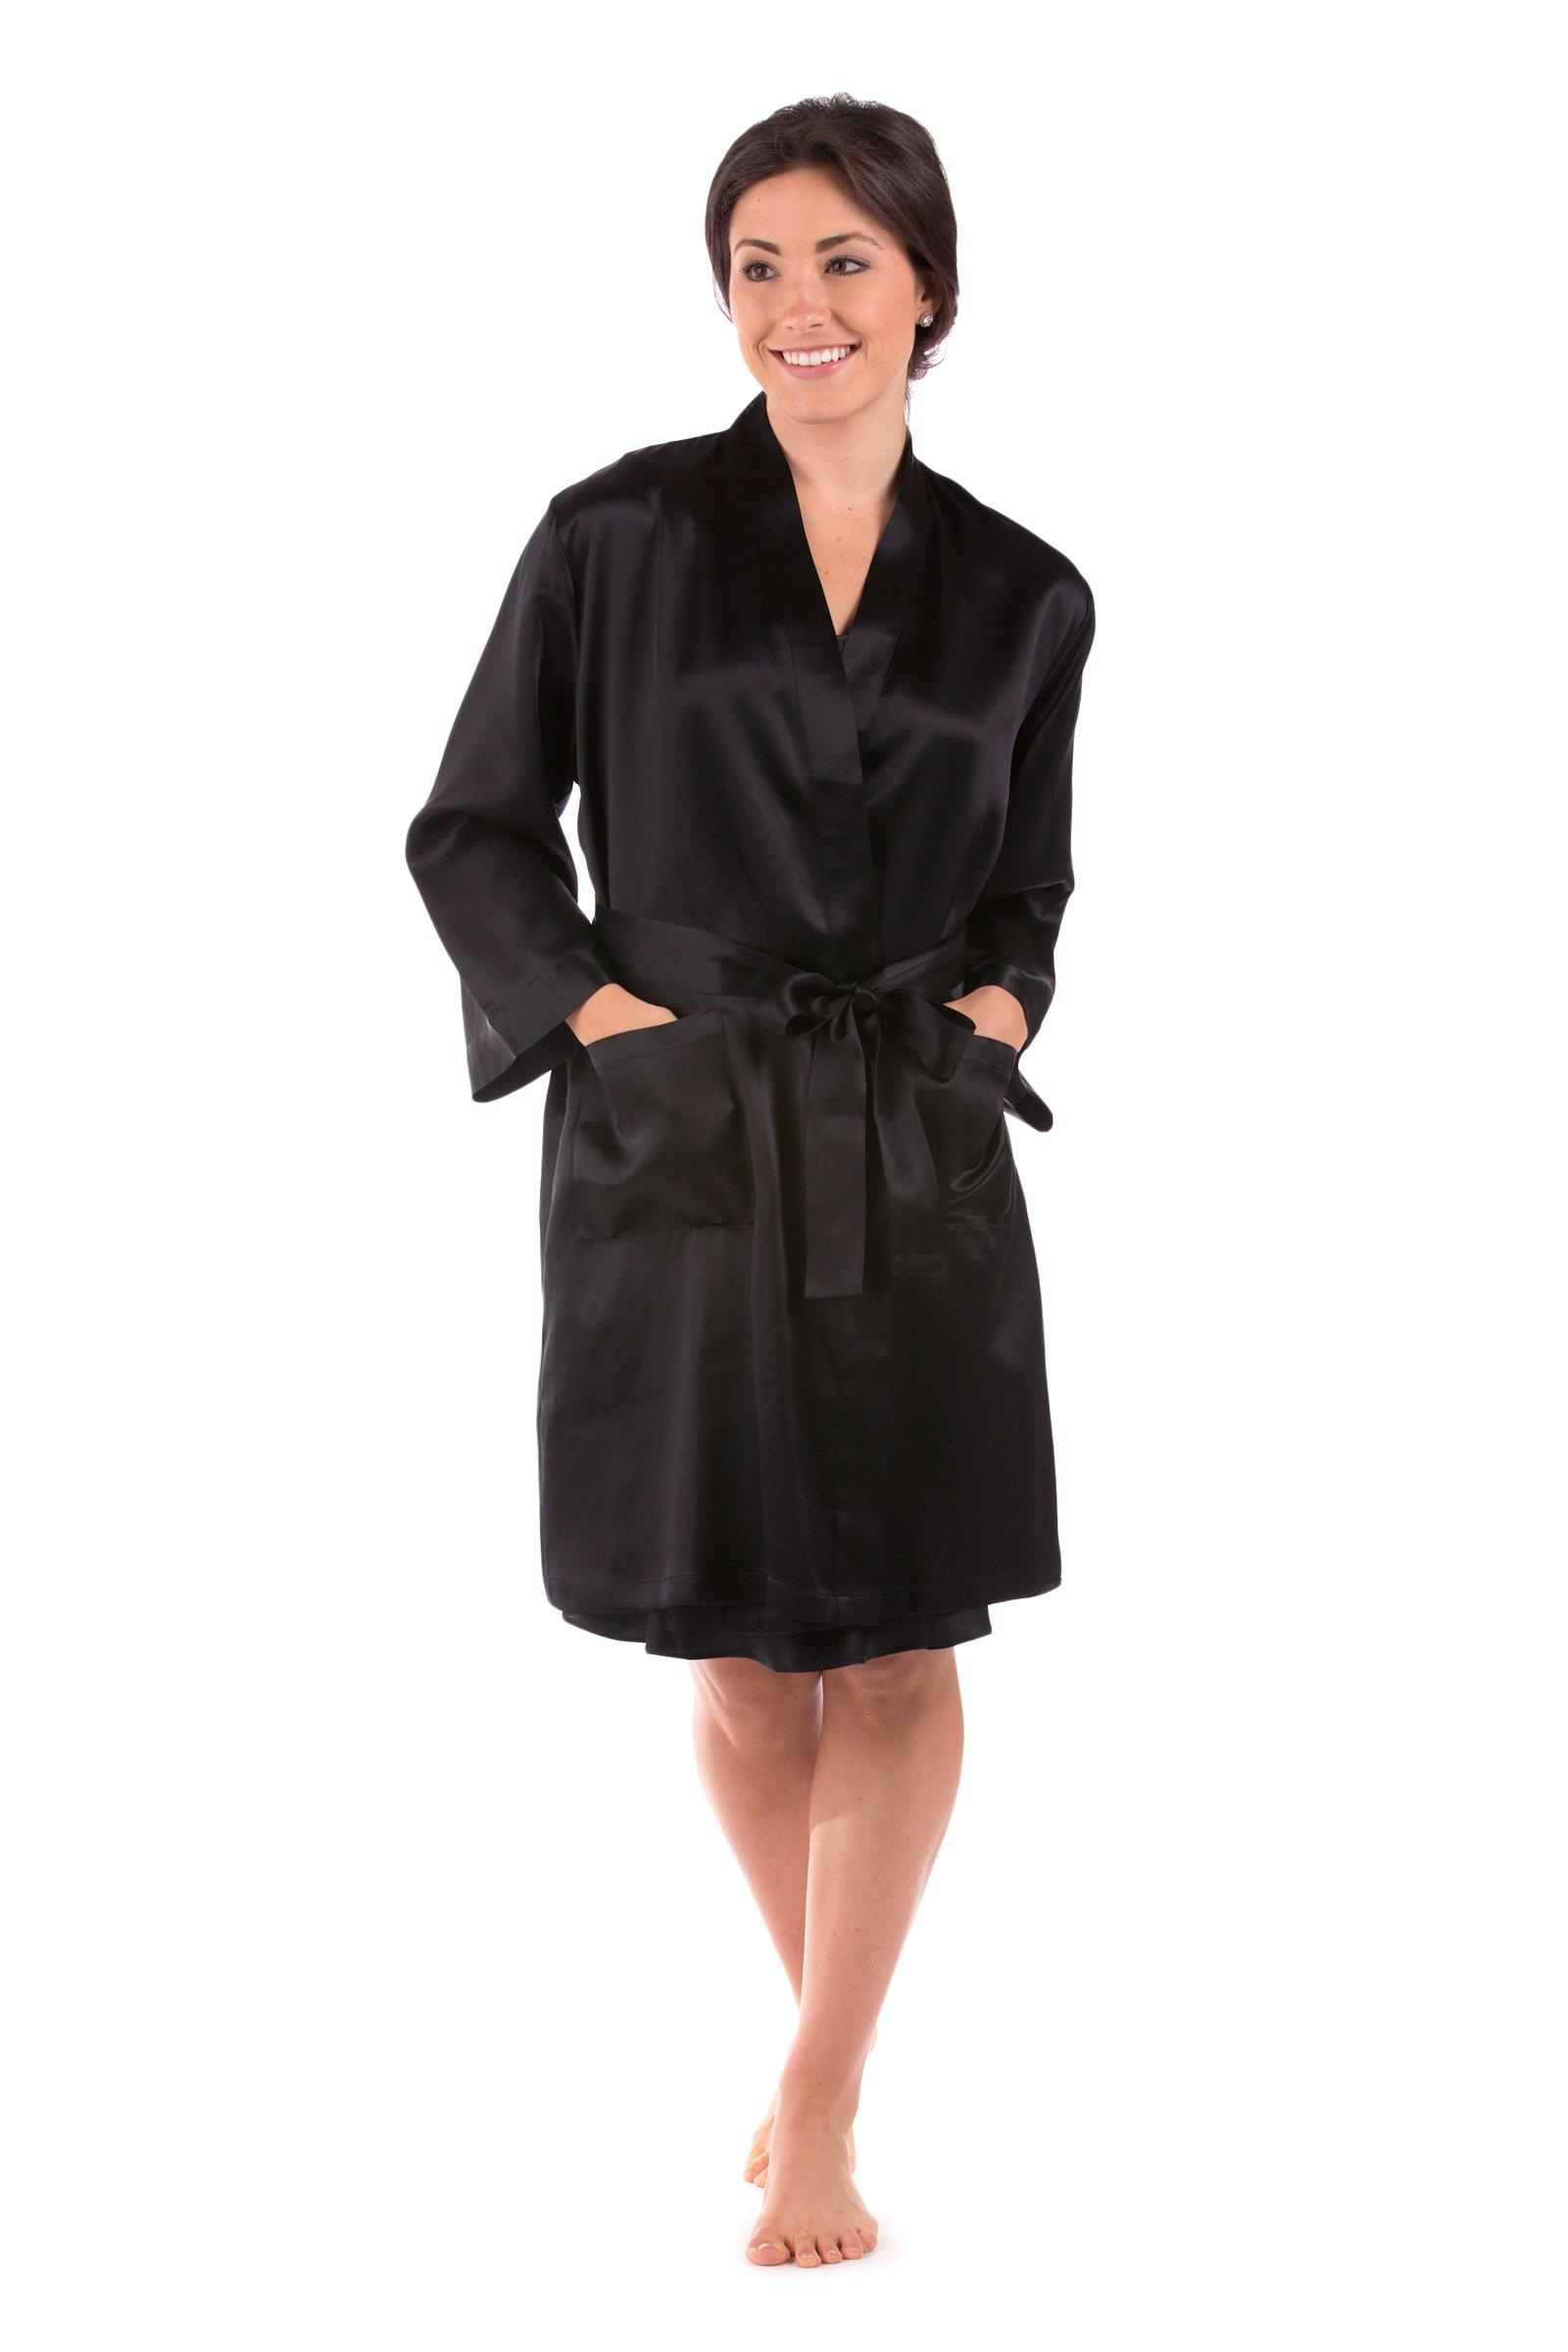 Women's Short 100% Silk Bathrobe - Luxury Robe by TexereSilk (Midnight Jewel, Black, Small/Medium) Great Gifts for Daughter Wife Fiancee WS0105-BLK-SM